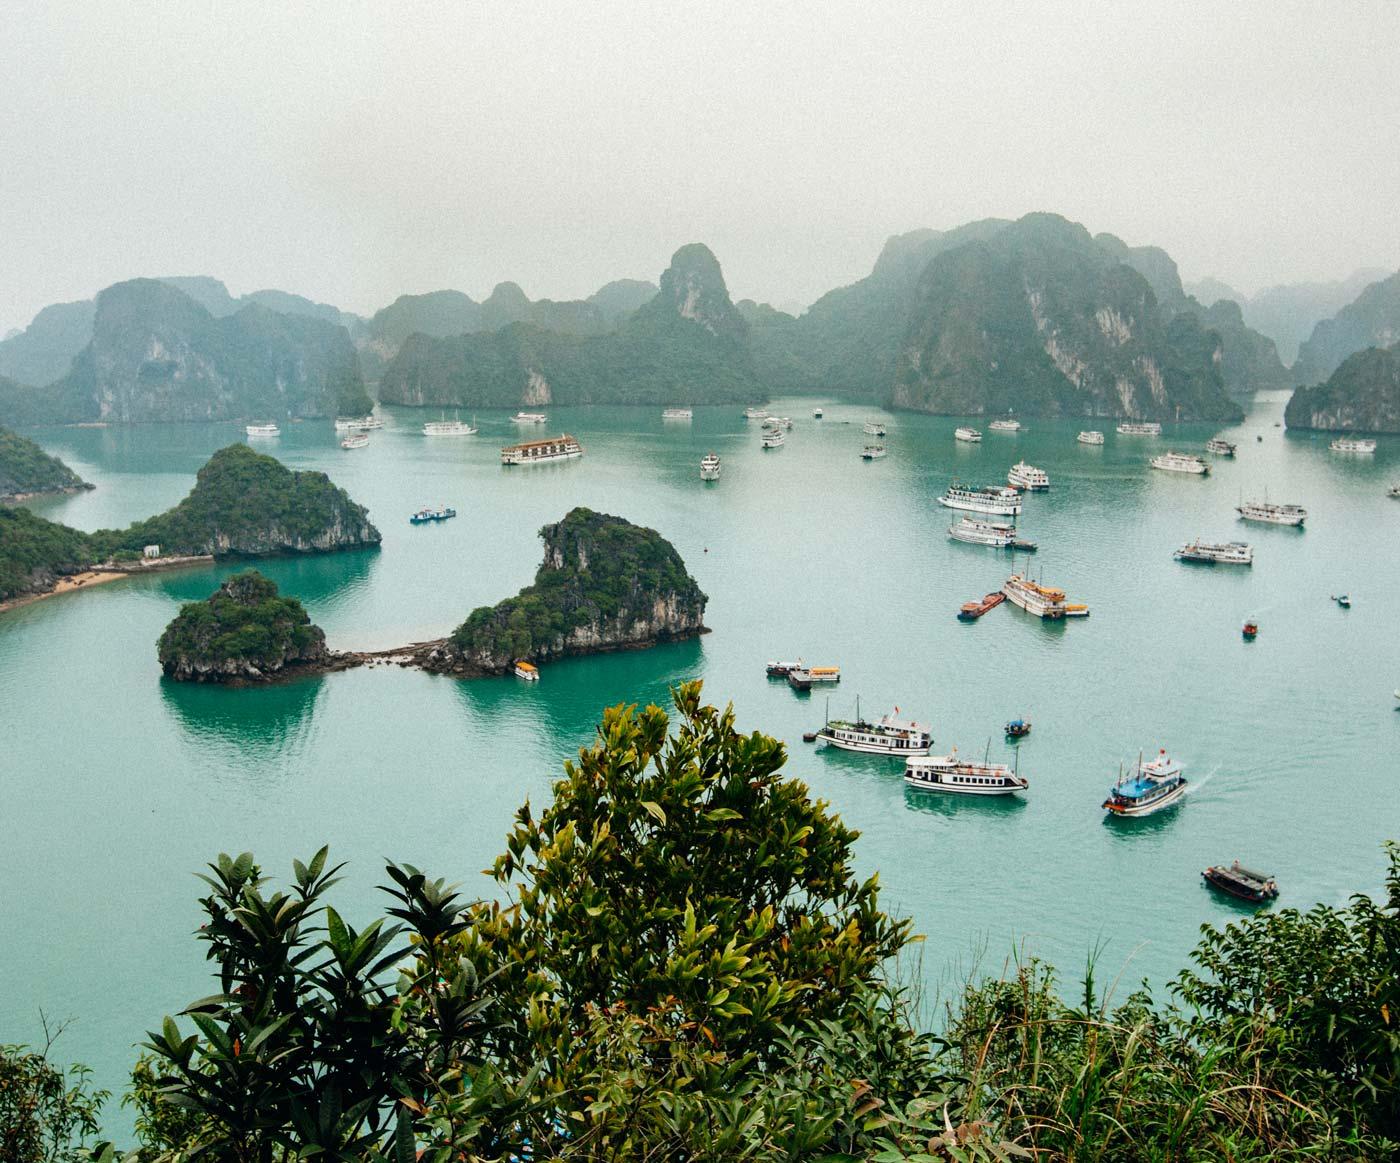 titop mountain lookout ha long bay vietnam - خلیج هالونگ ، از جاذبه های محبوب ویتنام | Ha Long Bay